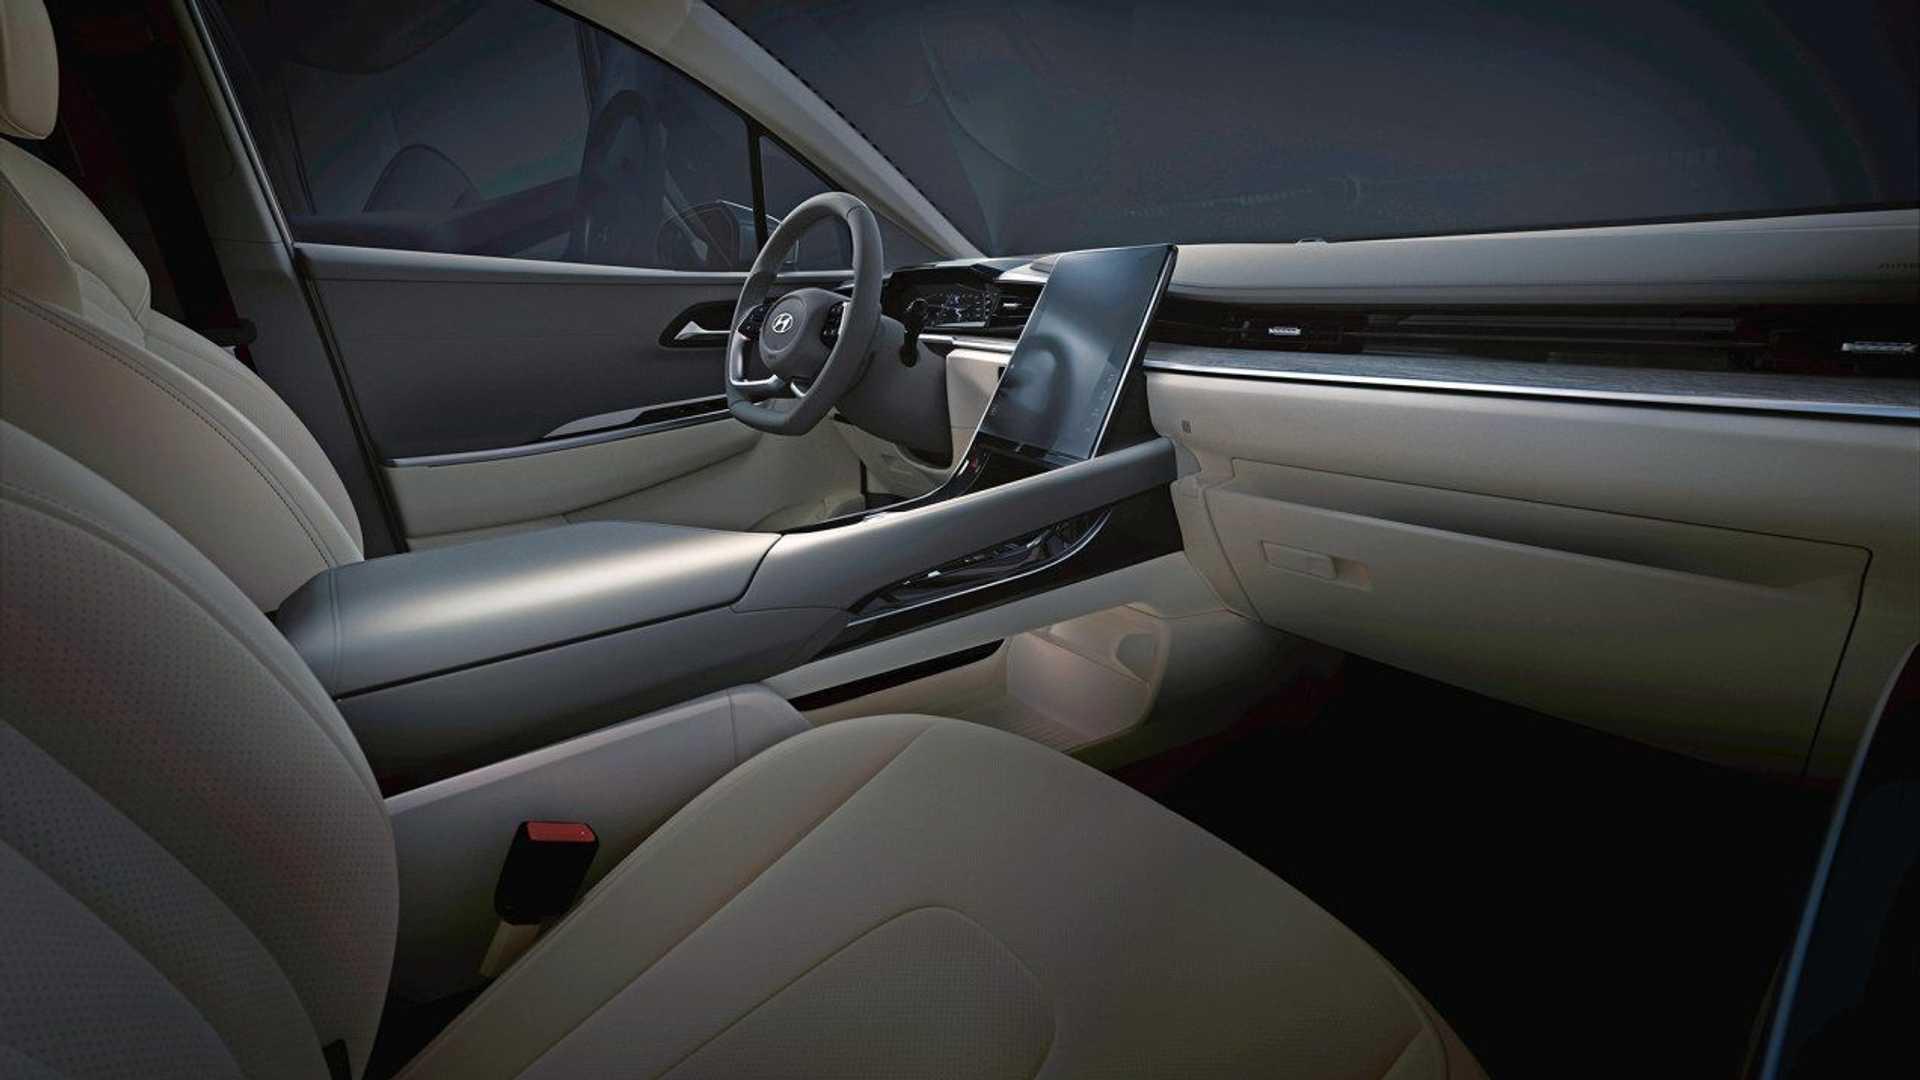 Hyundai-Custo-photos-15